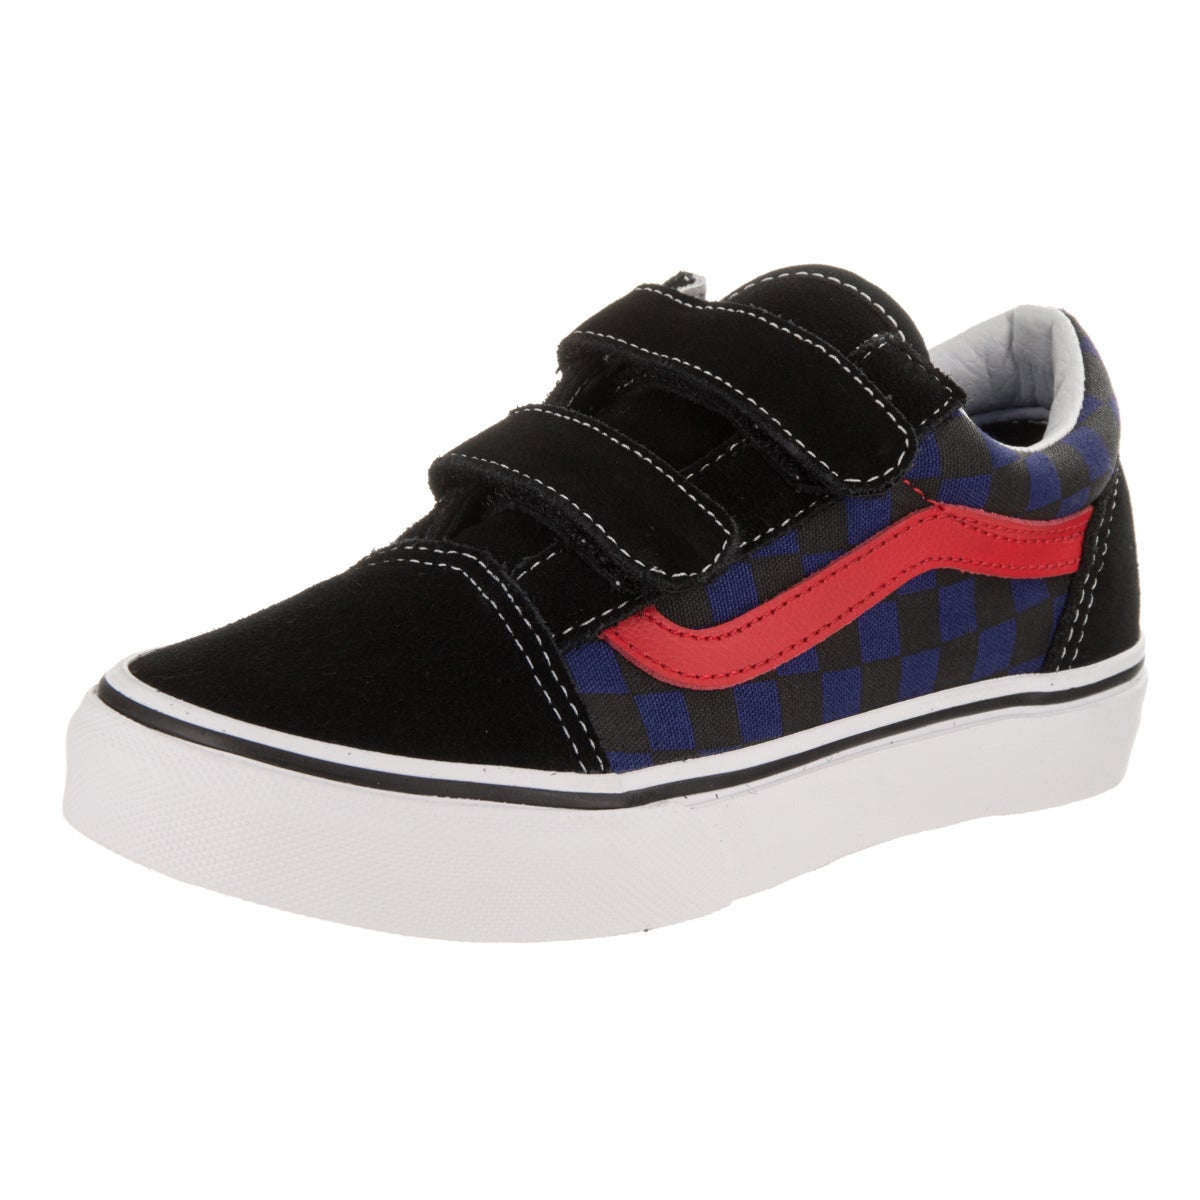 620344dc39 Shop Vans Kids Old Skool V (Checkerboard) Skate Shoe - Free Shipping Today  - Overstock - 16431937